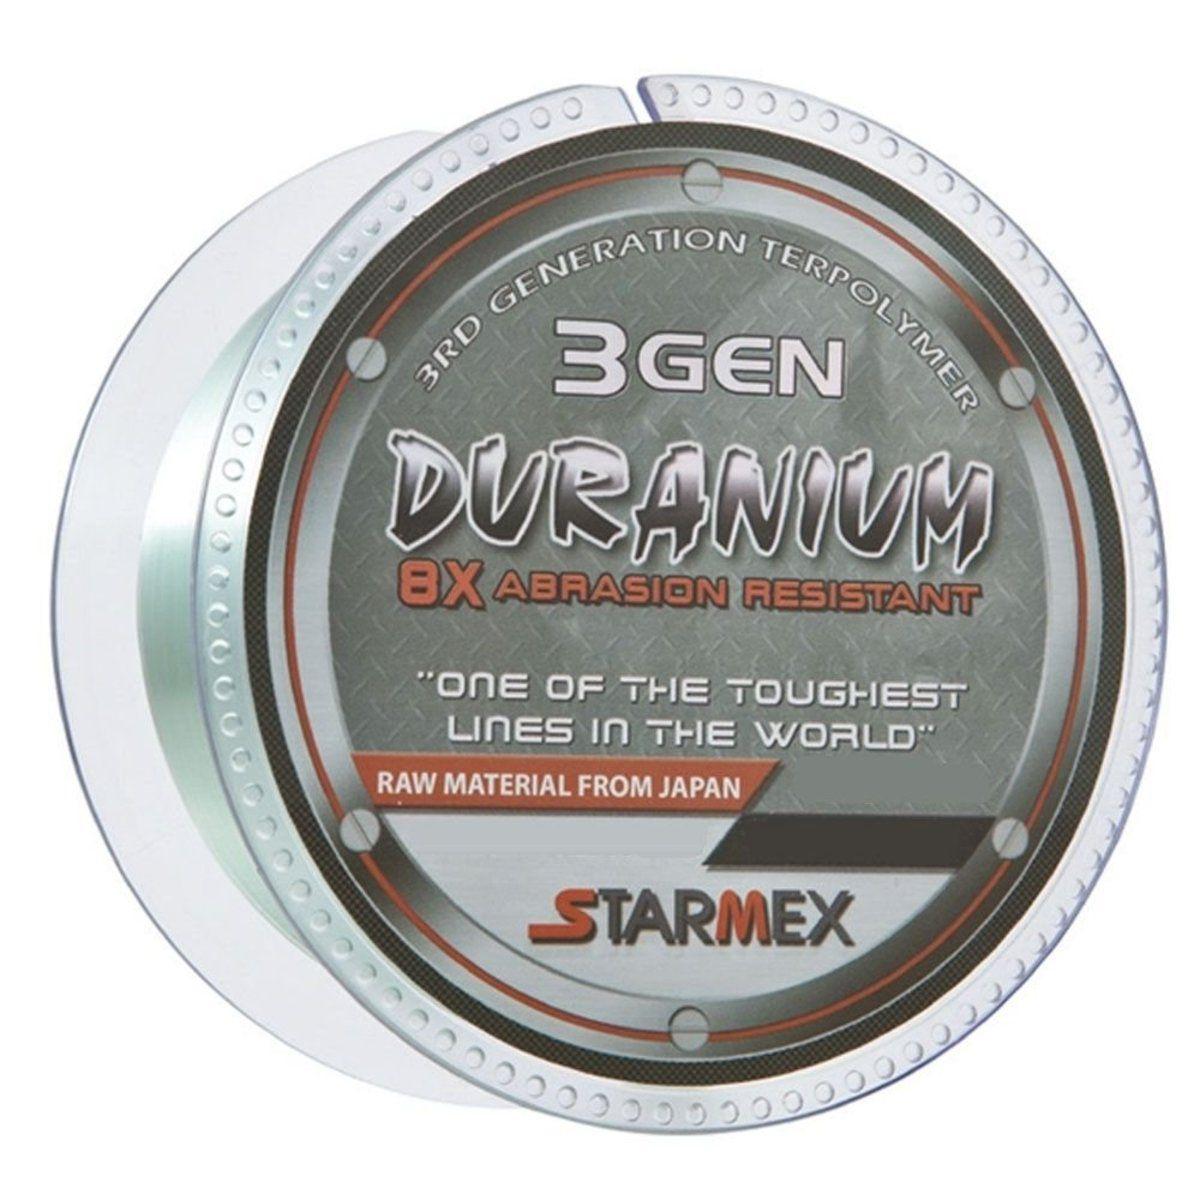 Linha Monofilamento Starmex Duranium/DuraNew 8x 3 GEN 0,22mm 13Lbs 300m - Cinza